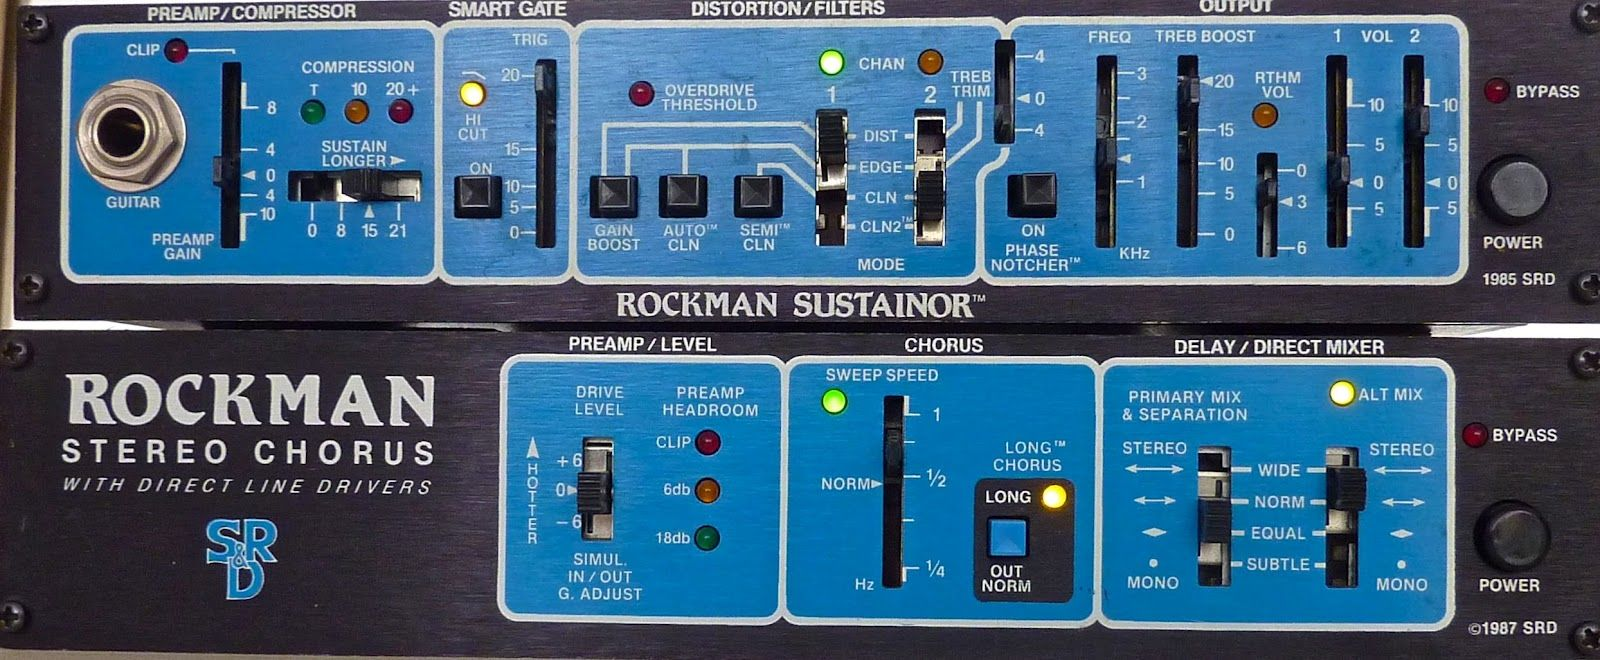 instrumental instruments scholz rockman guitar effects units rockman sustainer and rockman. Black Bedroom Furniture Sets. Home Design Ideas